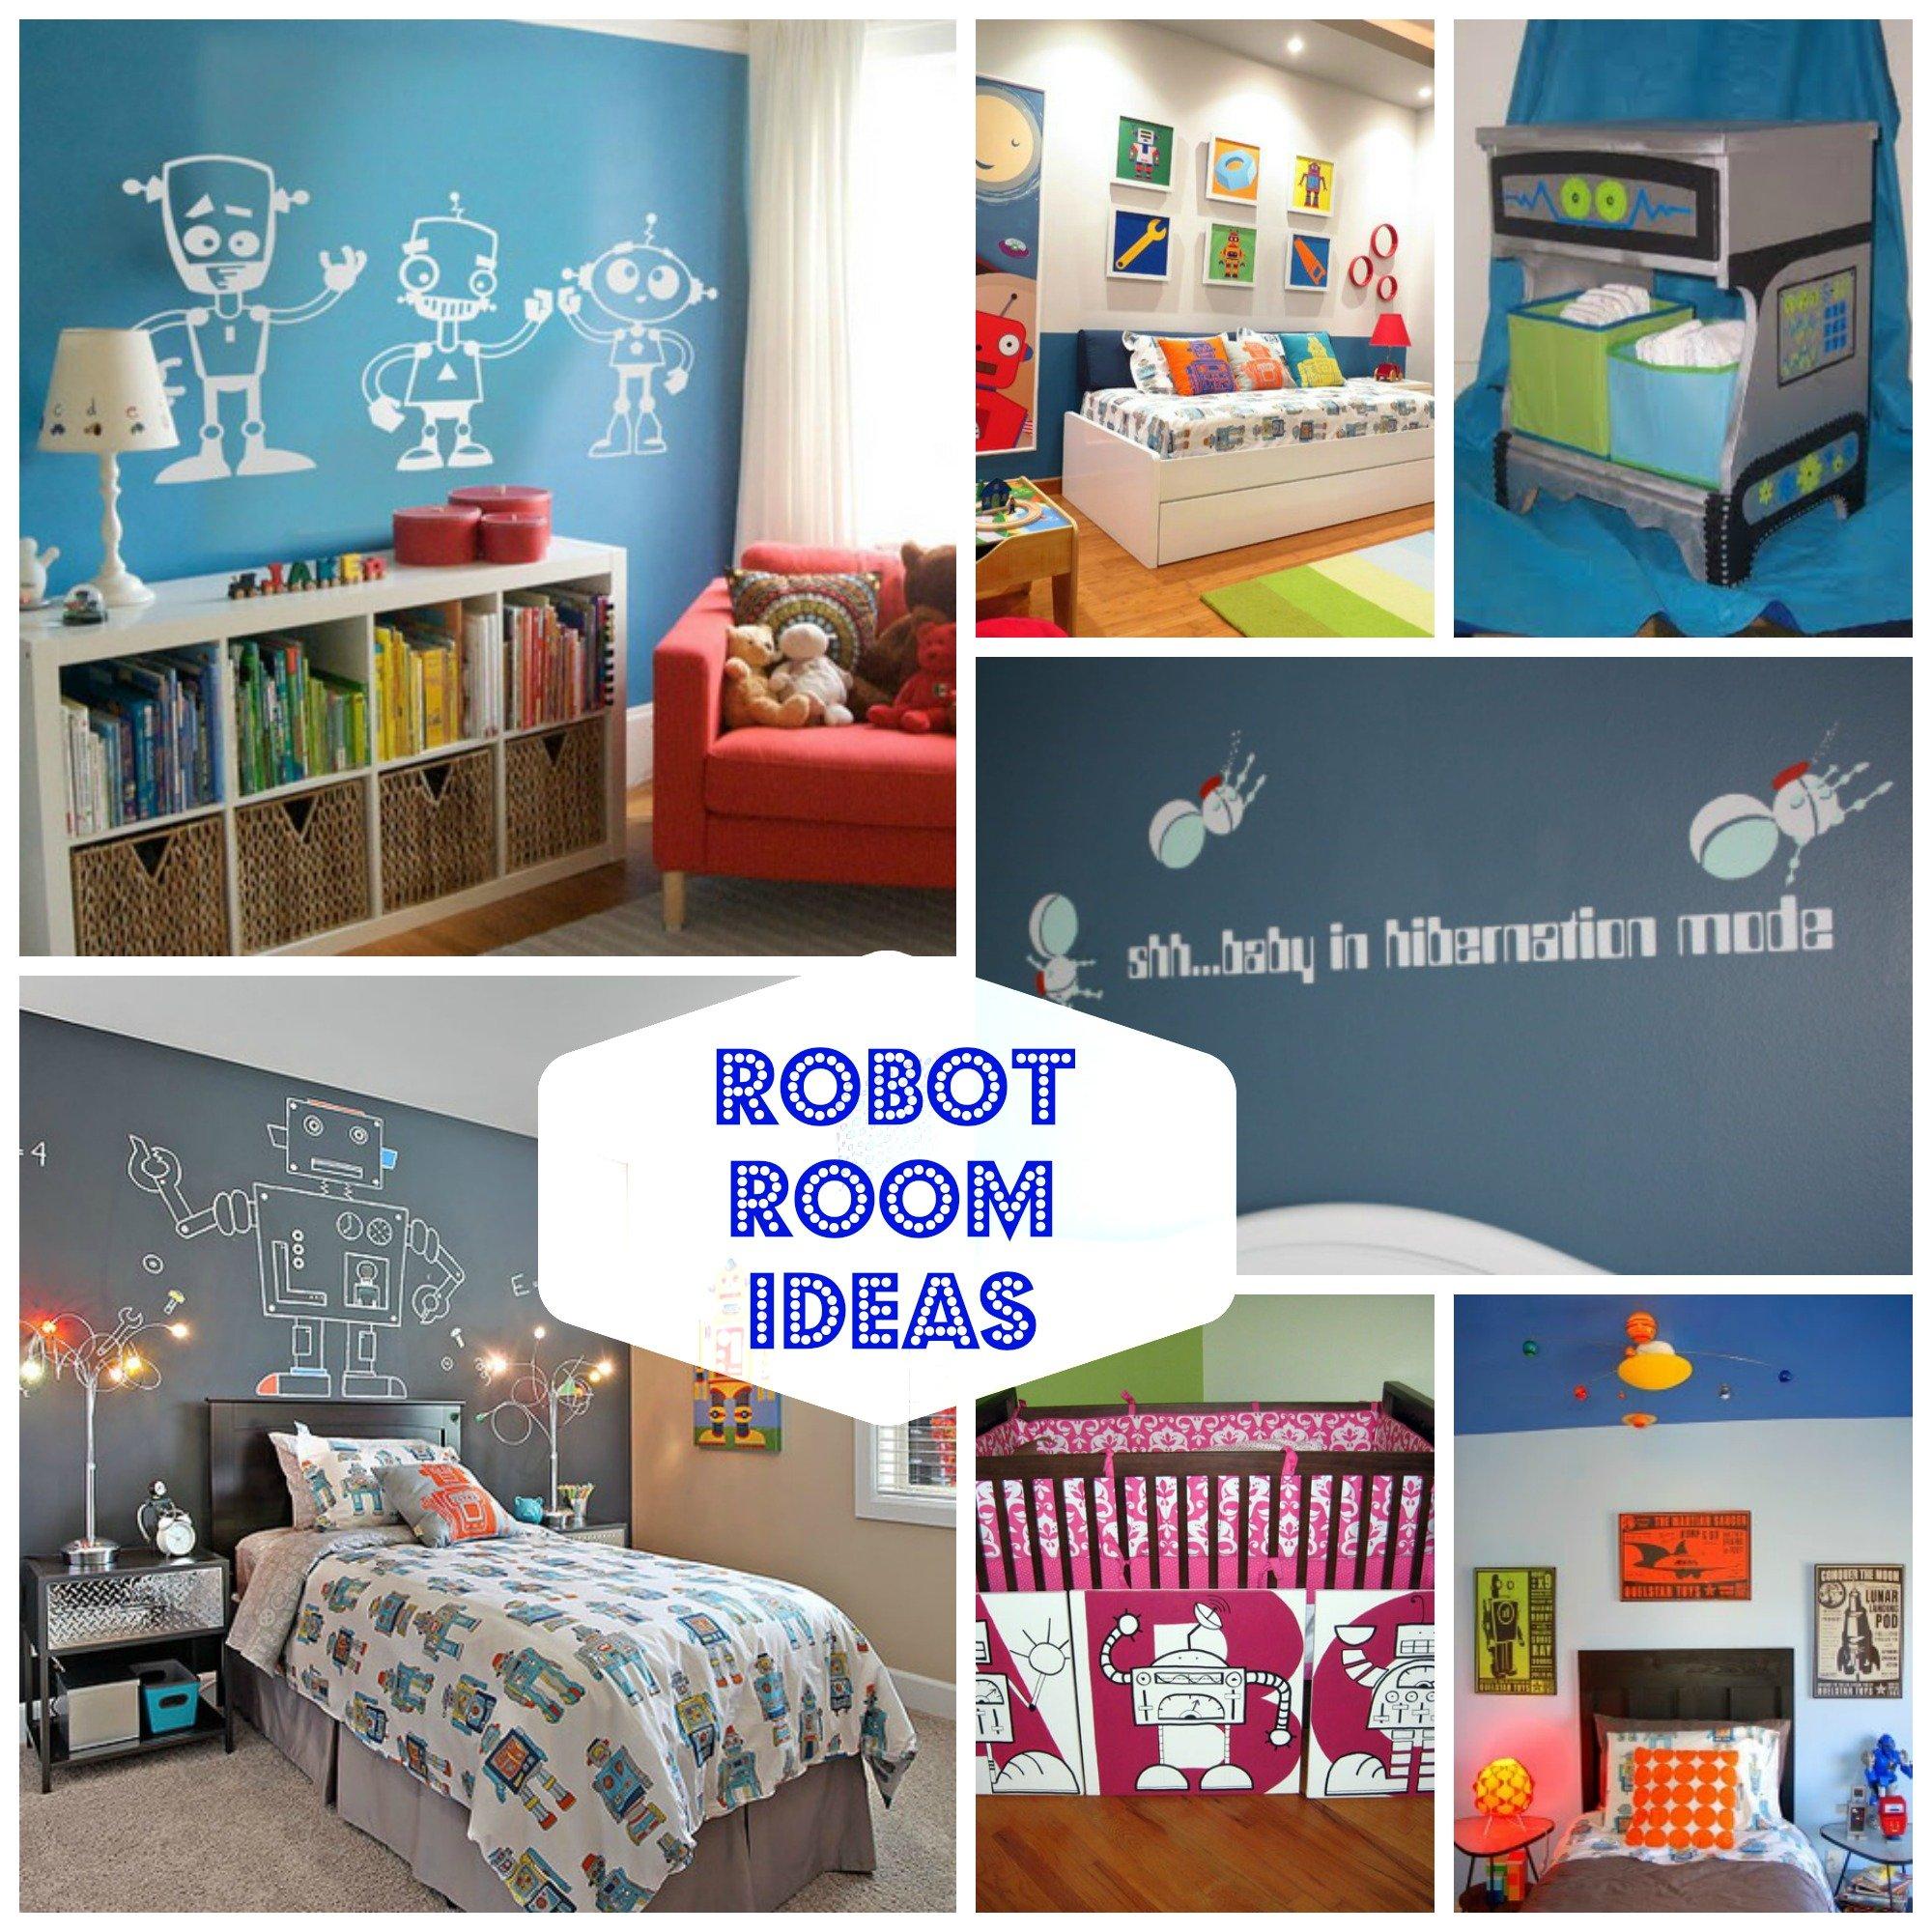 Robot room ideas design dazzle for Robot bedroom